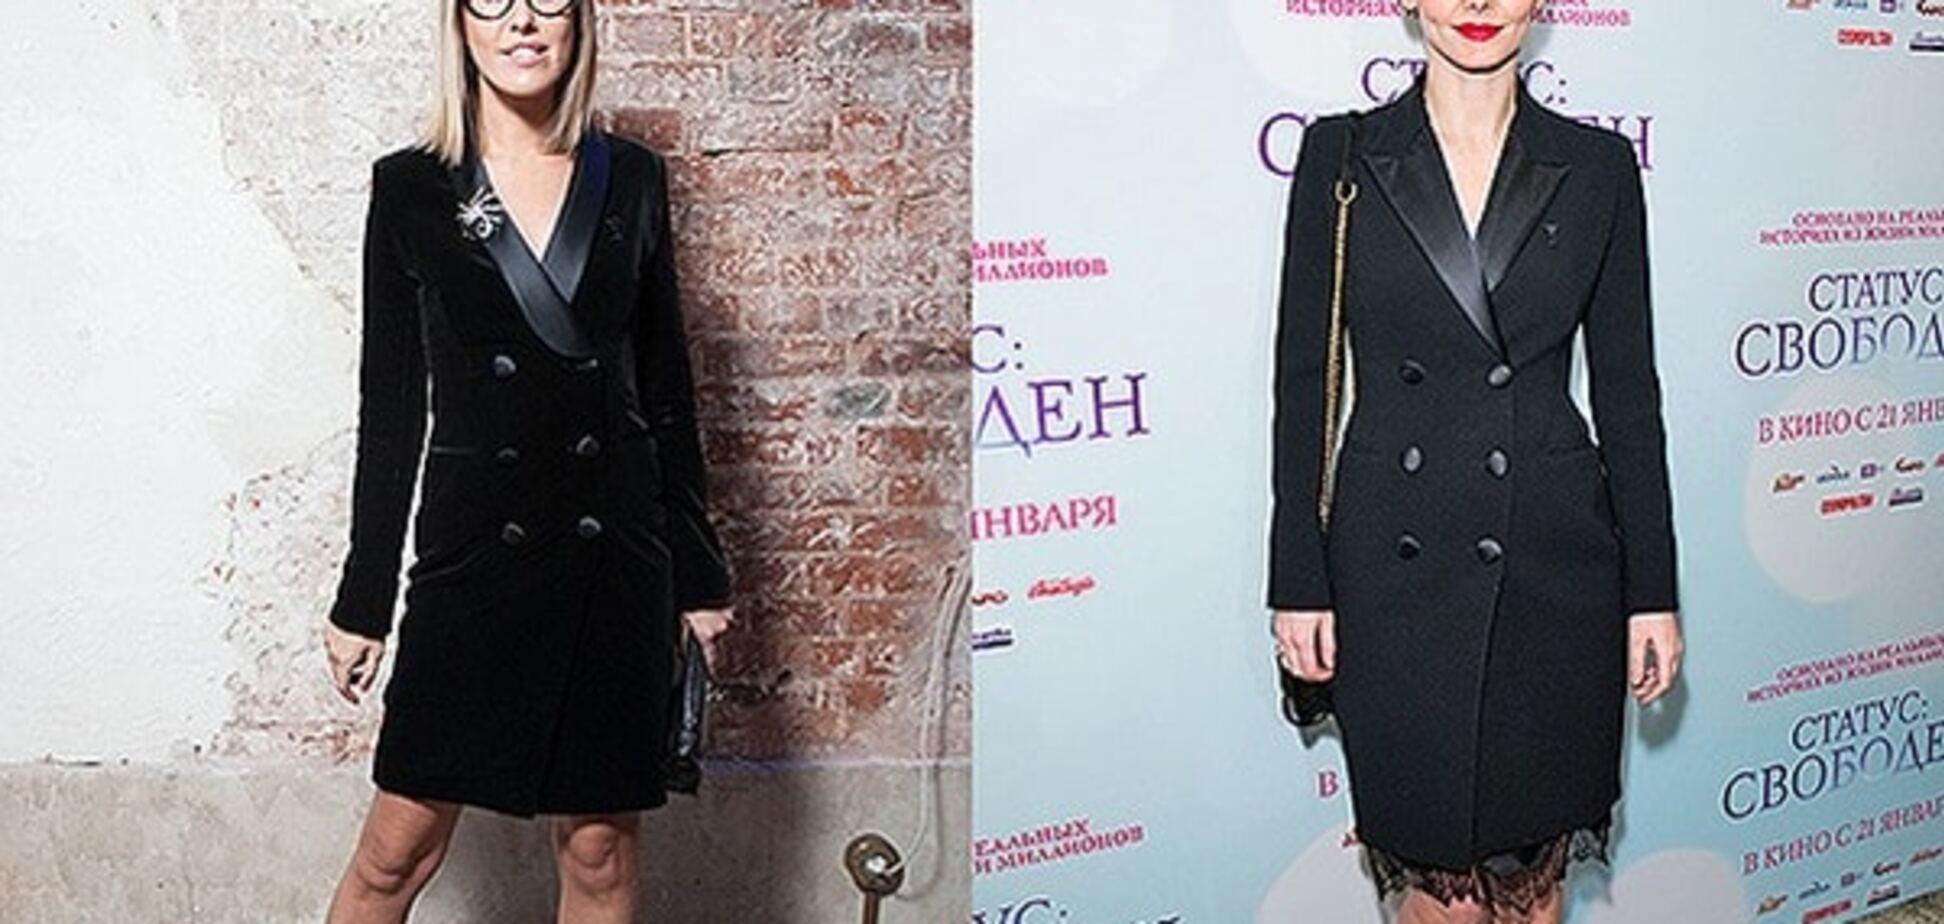 Модная битва: Ксения Собчак против Елизаветы Боярской